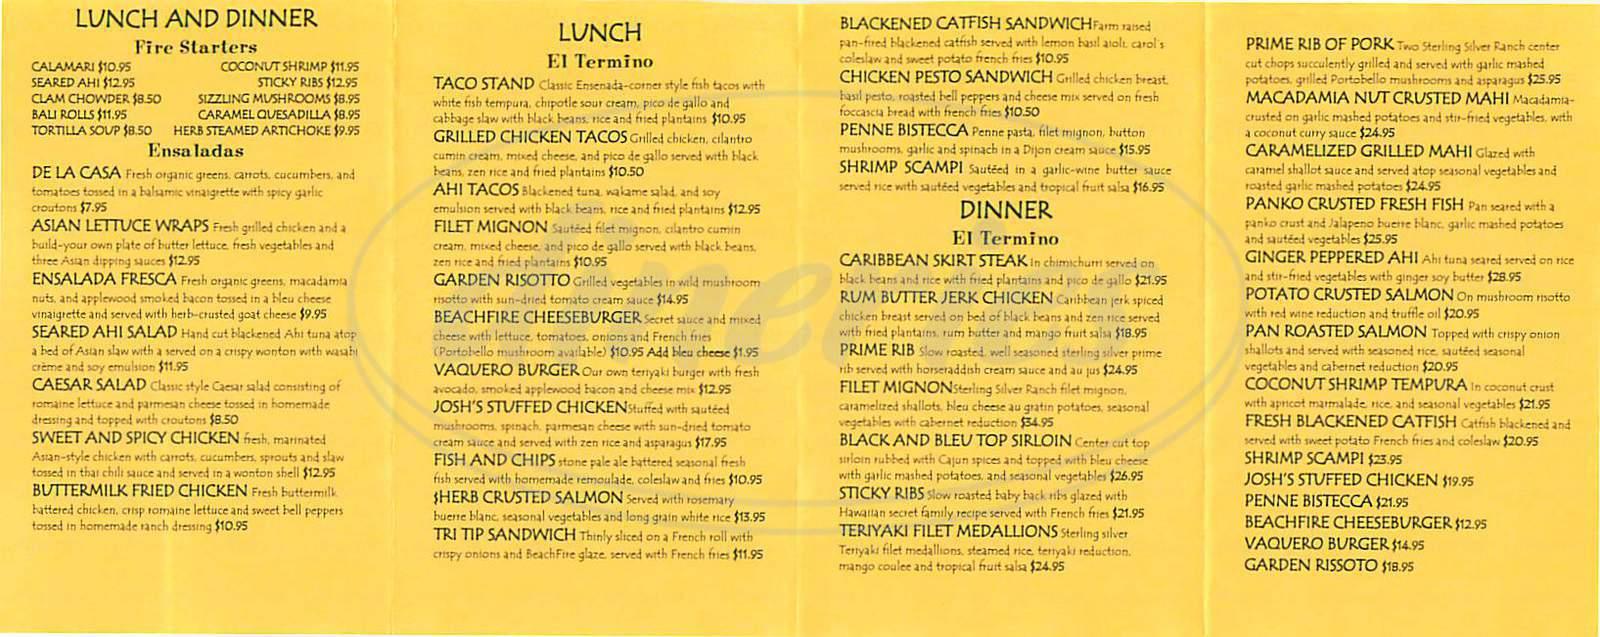 menu for Beach Fire